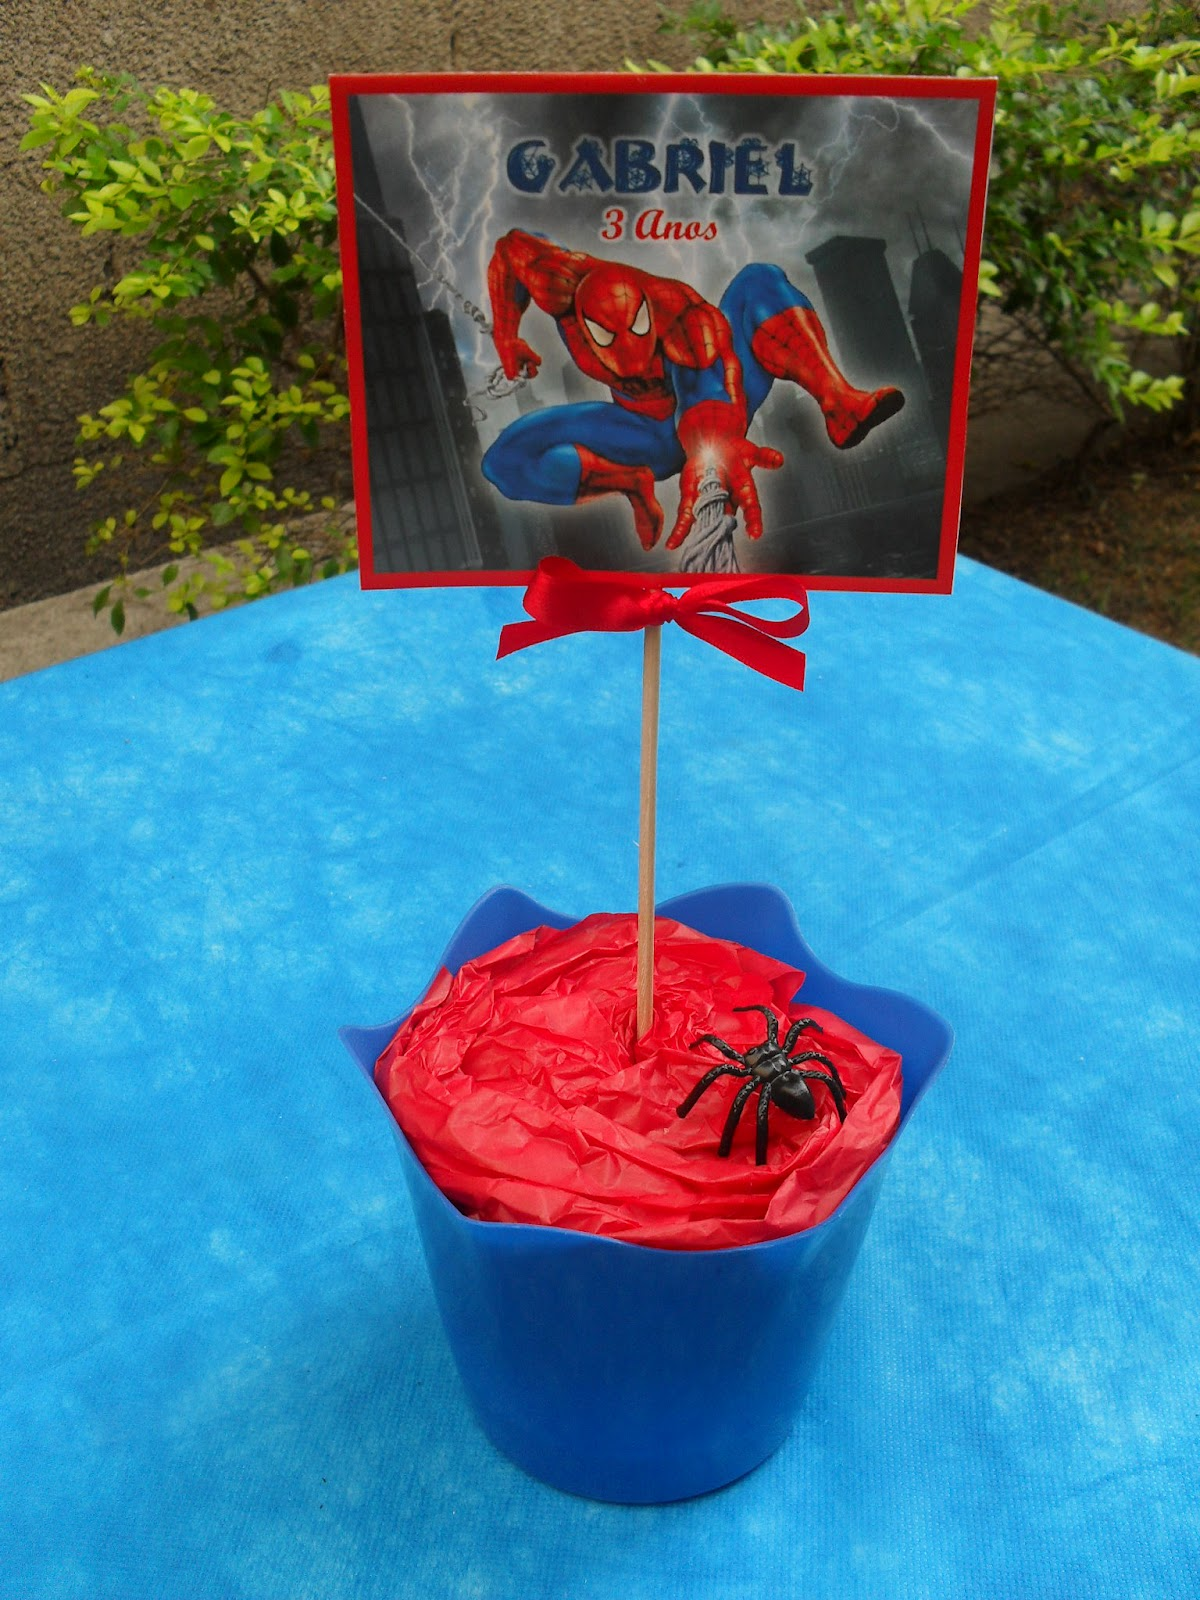 Coisinhas da Gi Ateli u00ea Enfeites de Mesa Homem Aranha Cachepots -> Enfeites De Mesa Do Homem Aranha